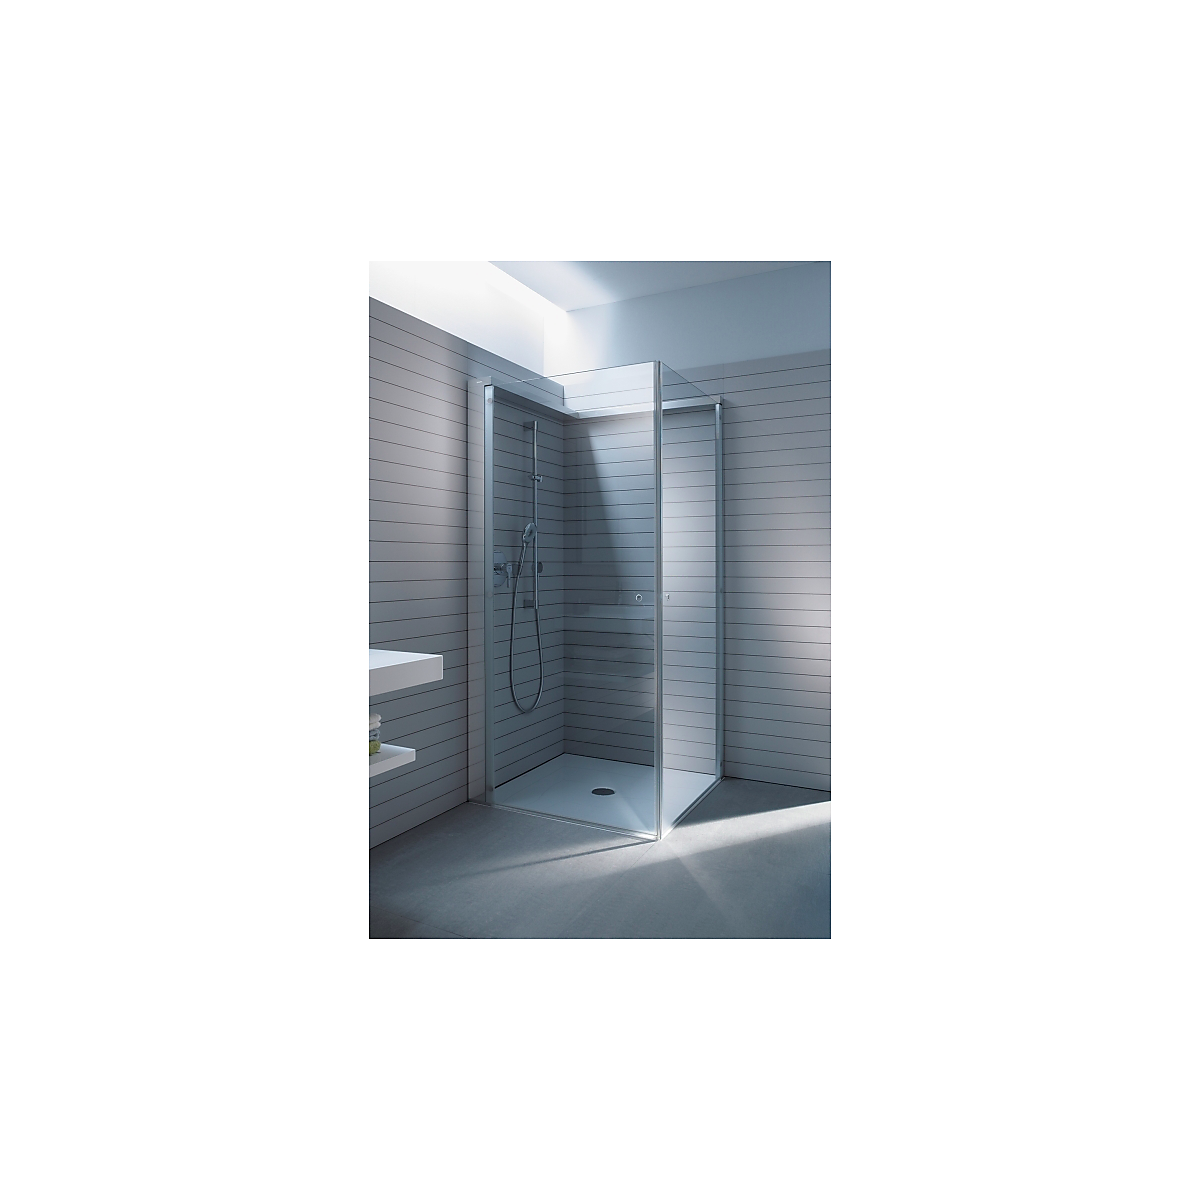 duravit openspace dusjhj rne 900x900 mm arm h yre. Black Bedroom Furniture Sets. Home Design Ideas